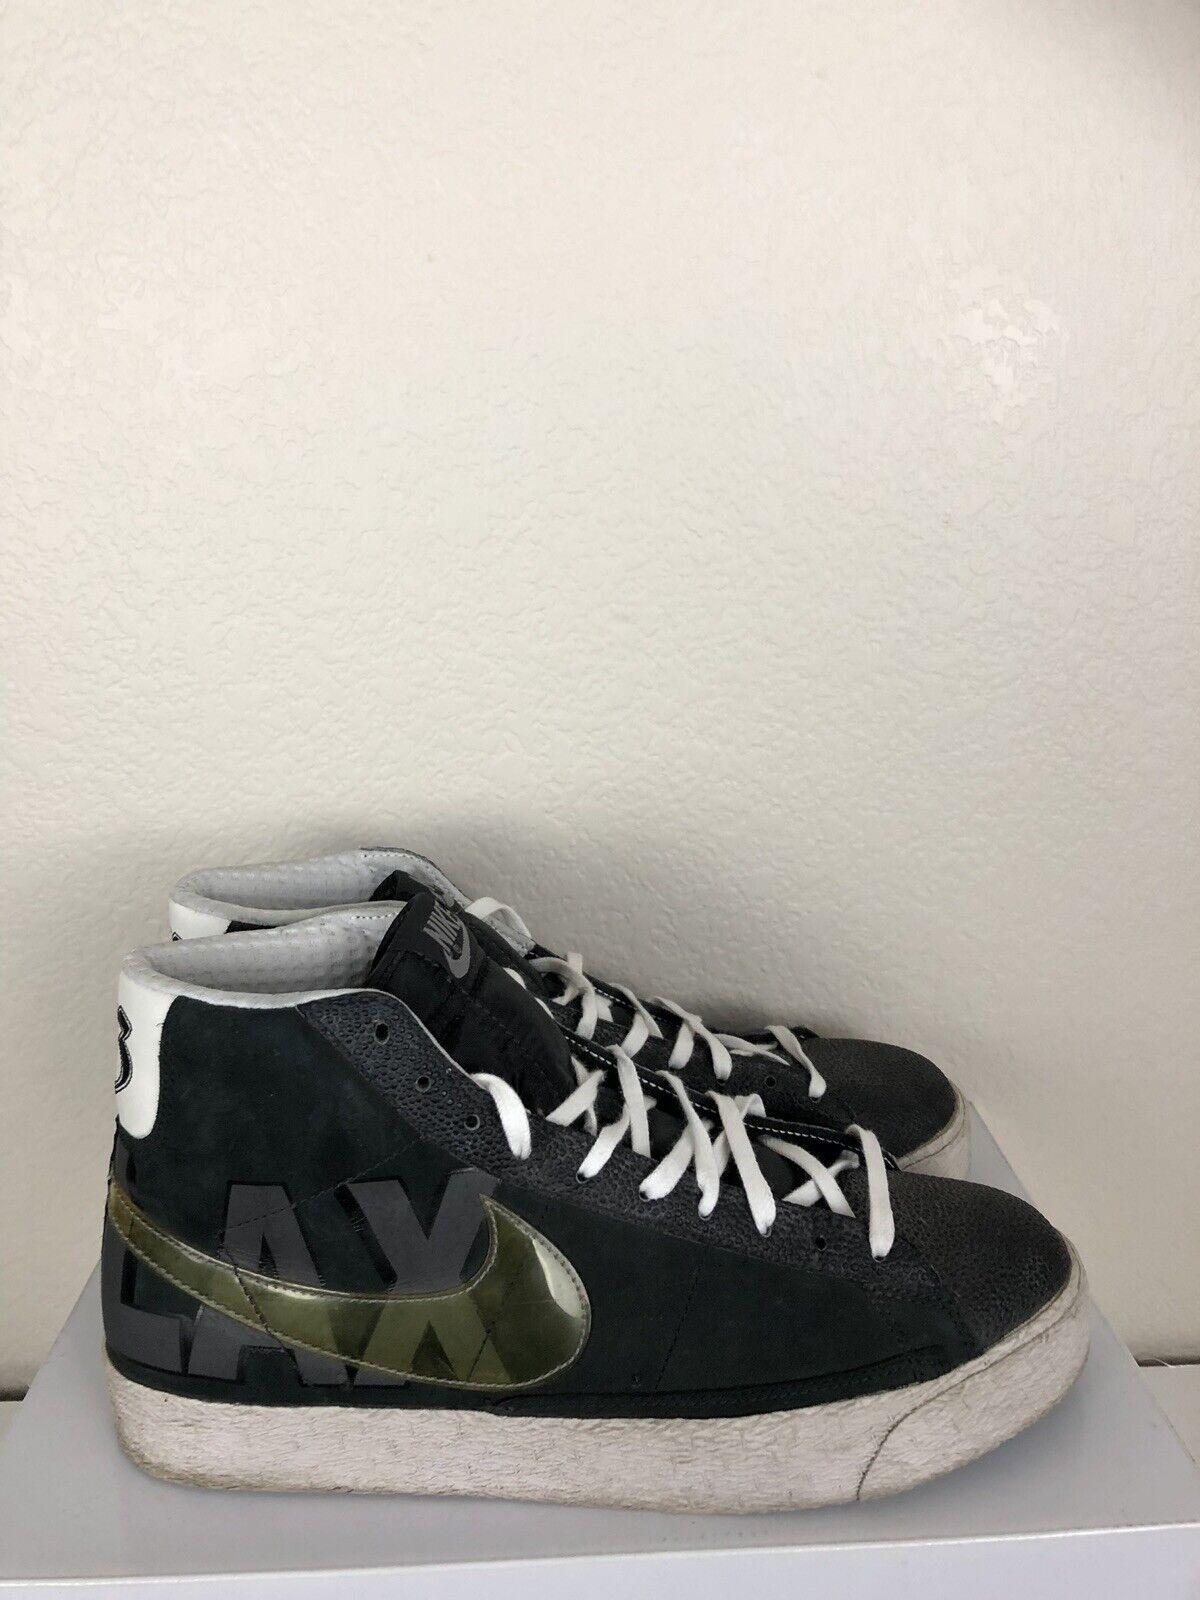 Nike Blazer High Top LAX Blazers Off White Grey 213 Sneakers 10.5